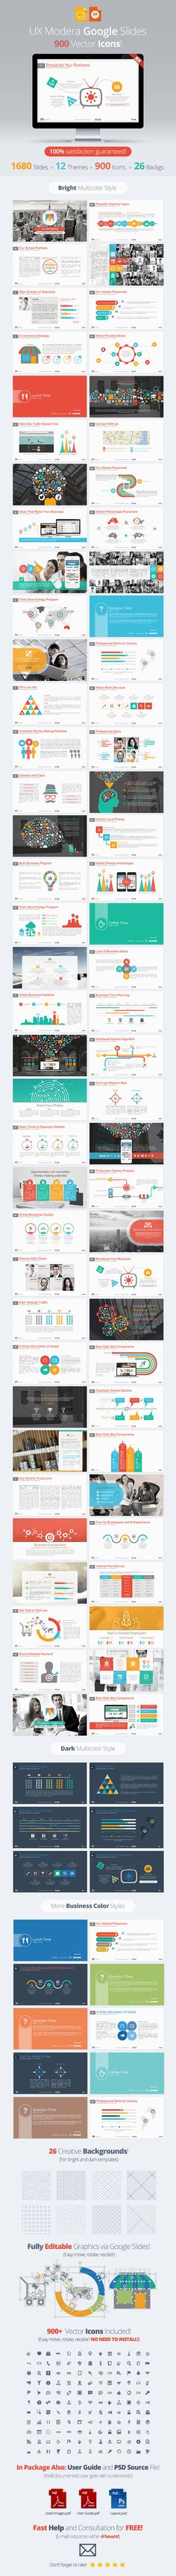 Modern #GoogleSlides #PresentationTemplate - Google Slides Presentation Templates